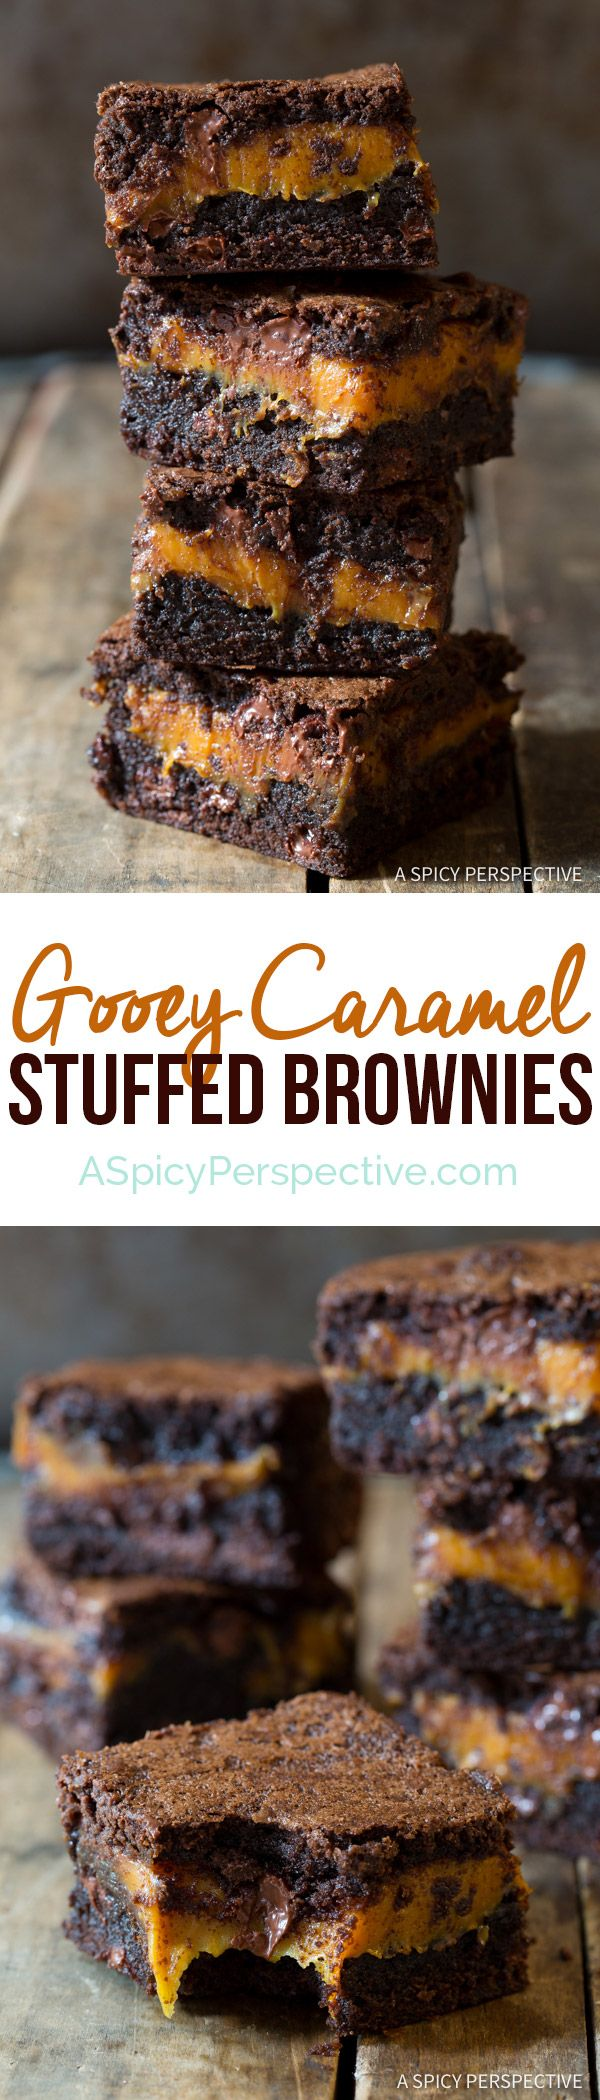 Gooey Caramel Stuffed Brownies | ASpicyPerspective.com